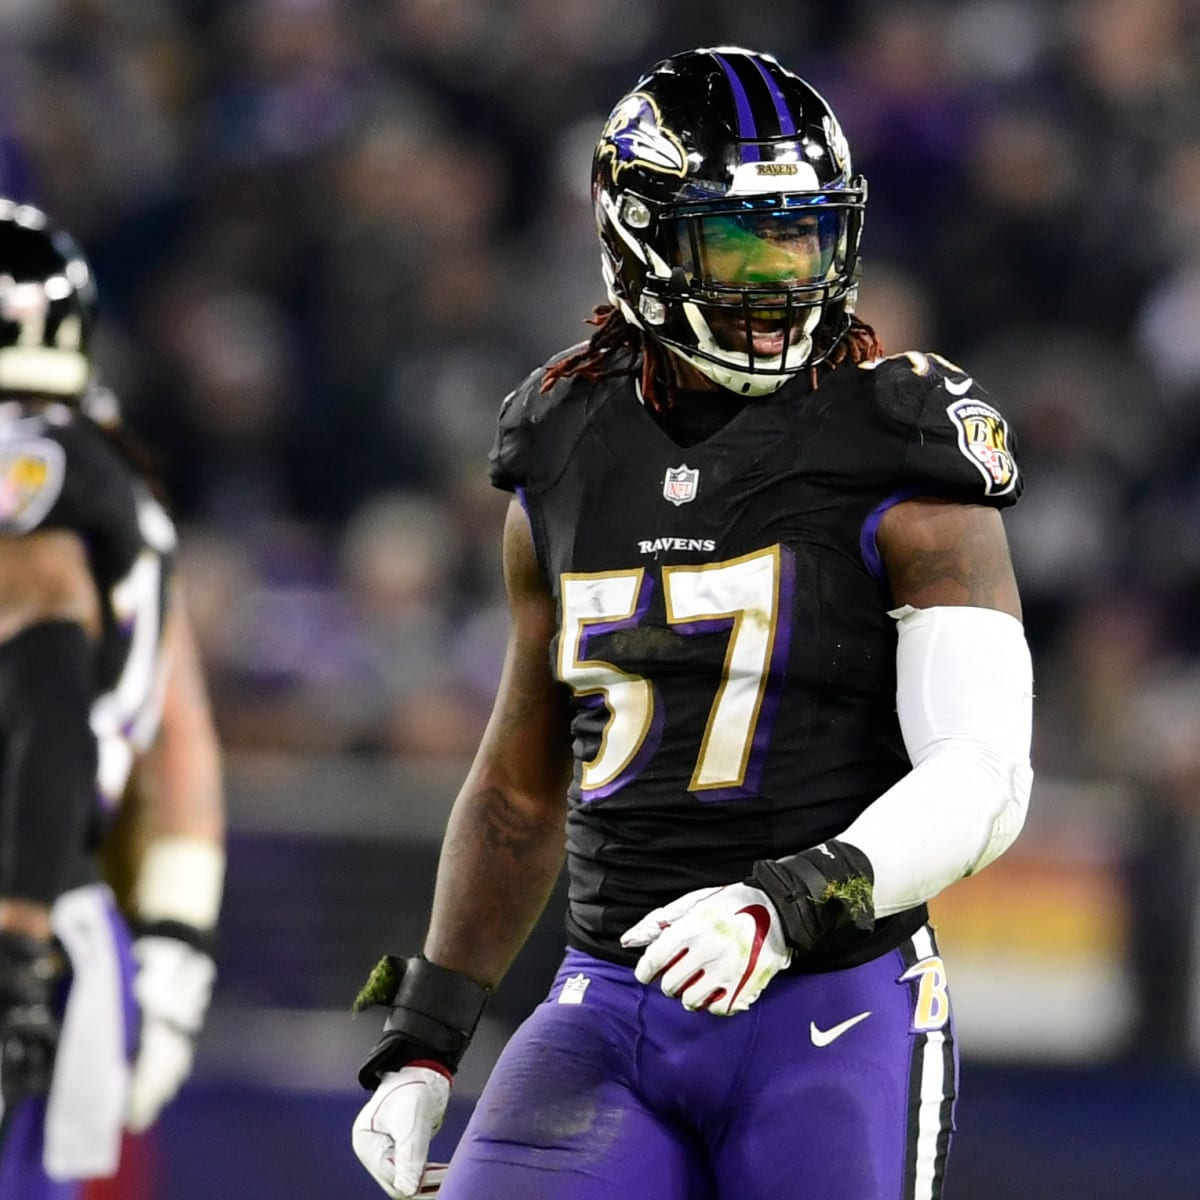 Former Ravens linebacker C.J. Mosley opts out of season